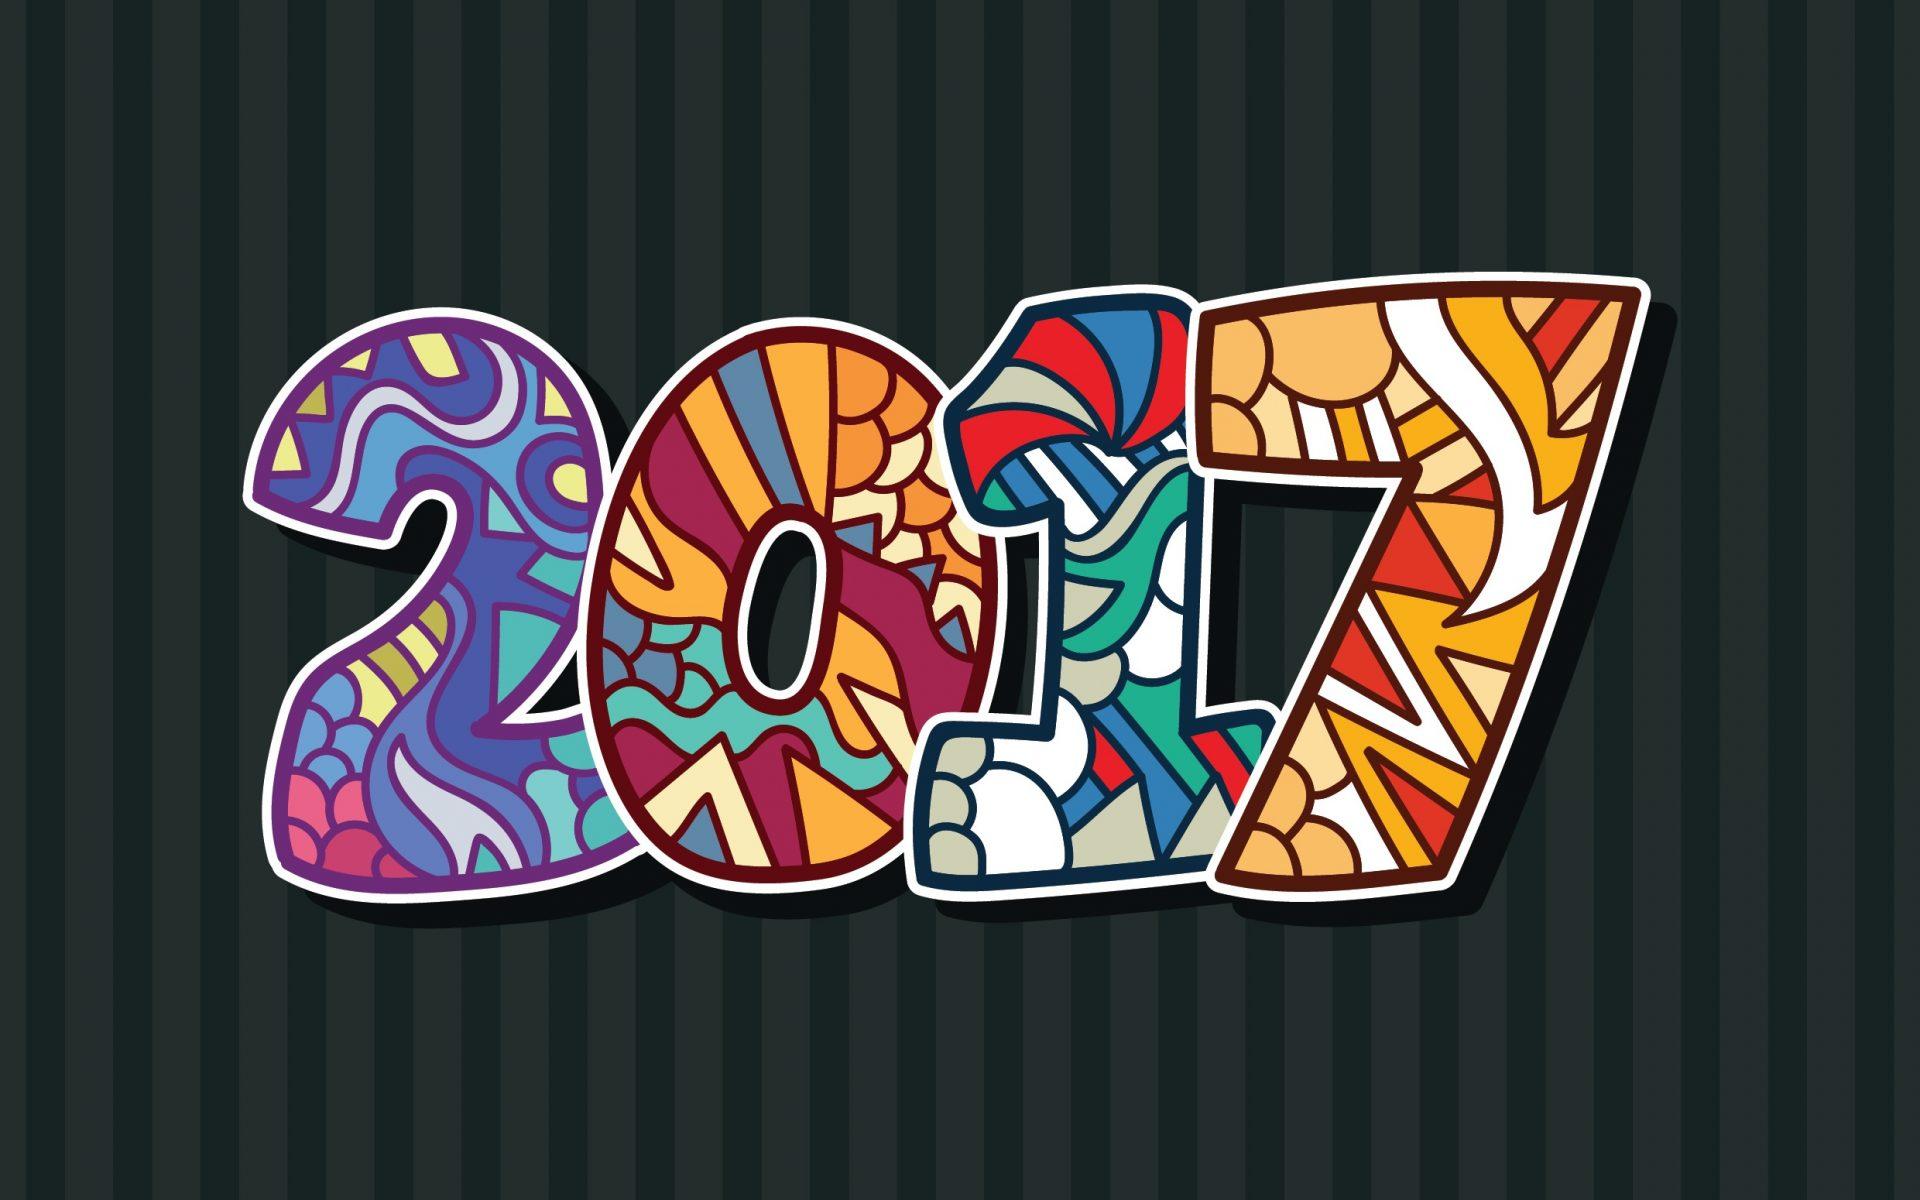 Happy New Year Greetings 2017 Wallpaper